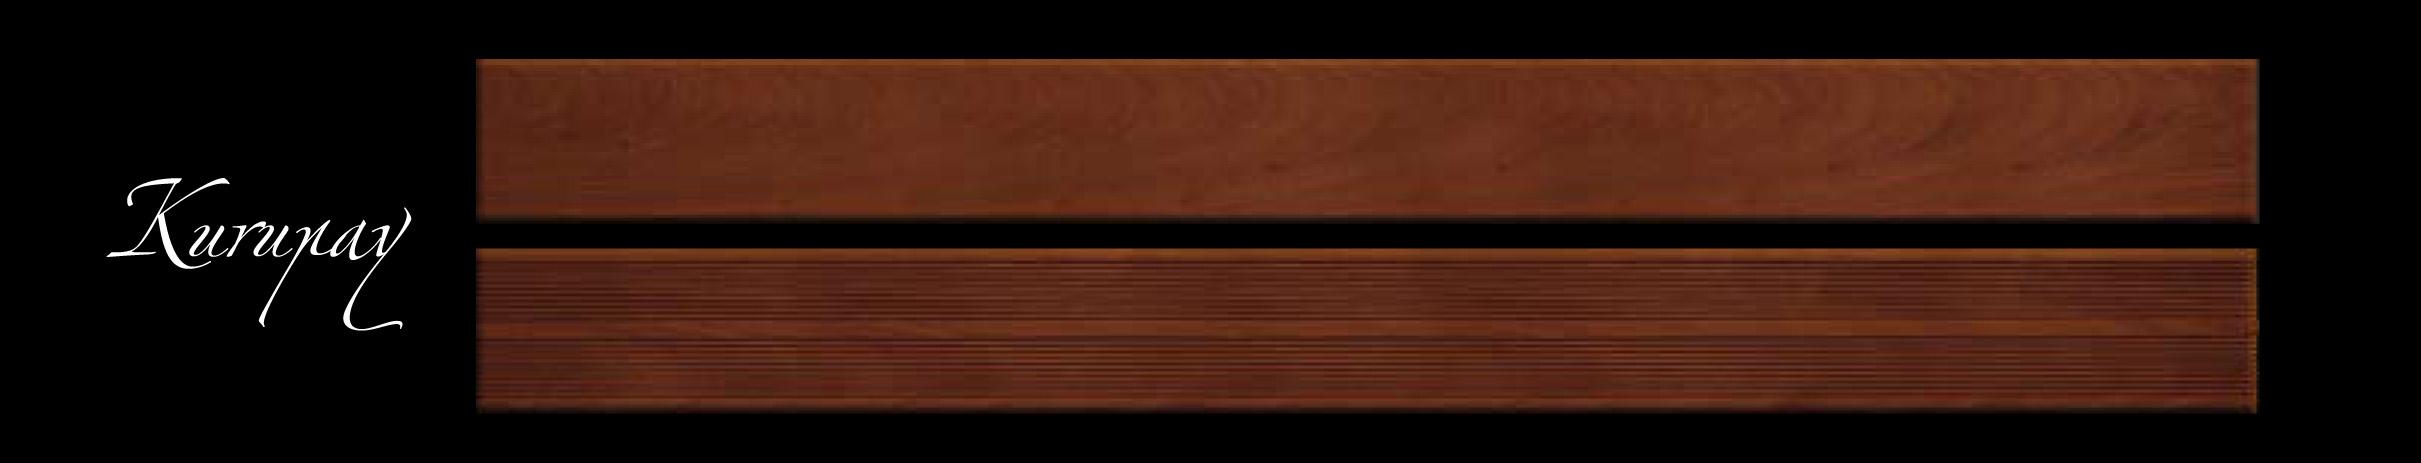 Pavimentazione Decking per esterni in legno KURUPAY, 100x1000/2000x19 mm, vendita al Mq ...